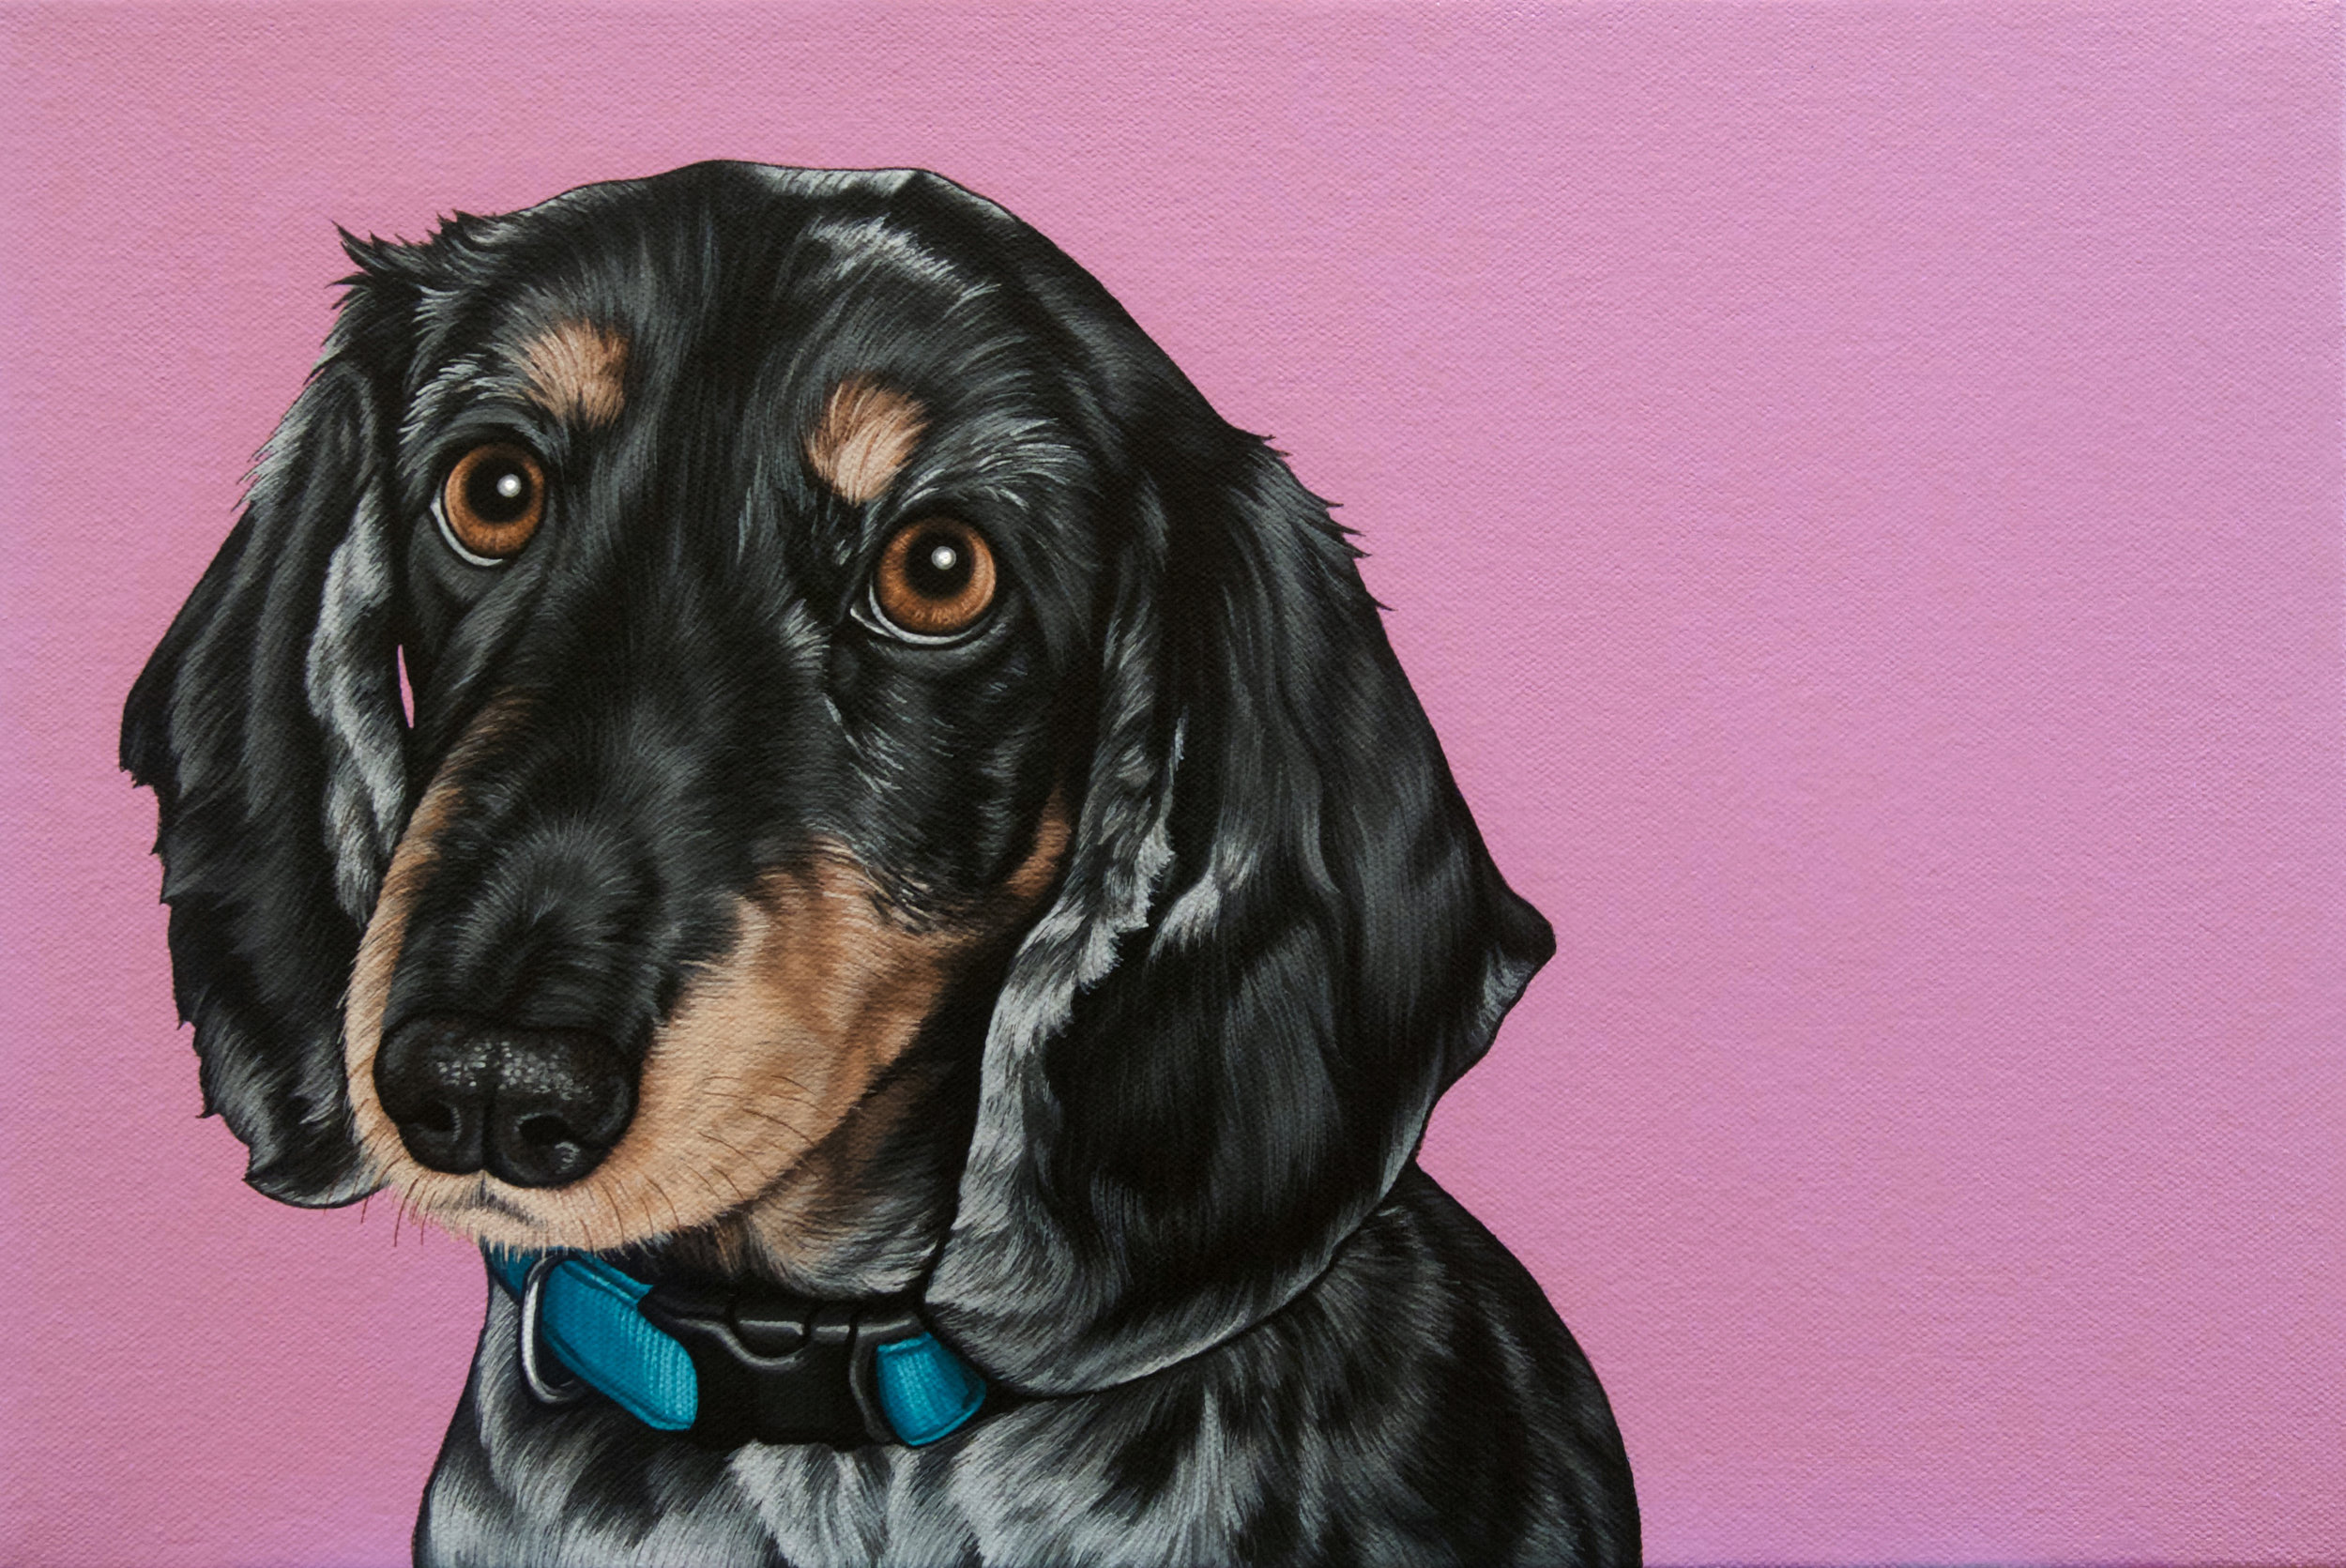 """Millie"", latex enamel on canvas, 11"" x 15"", 2016"